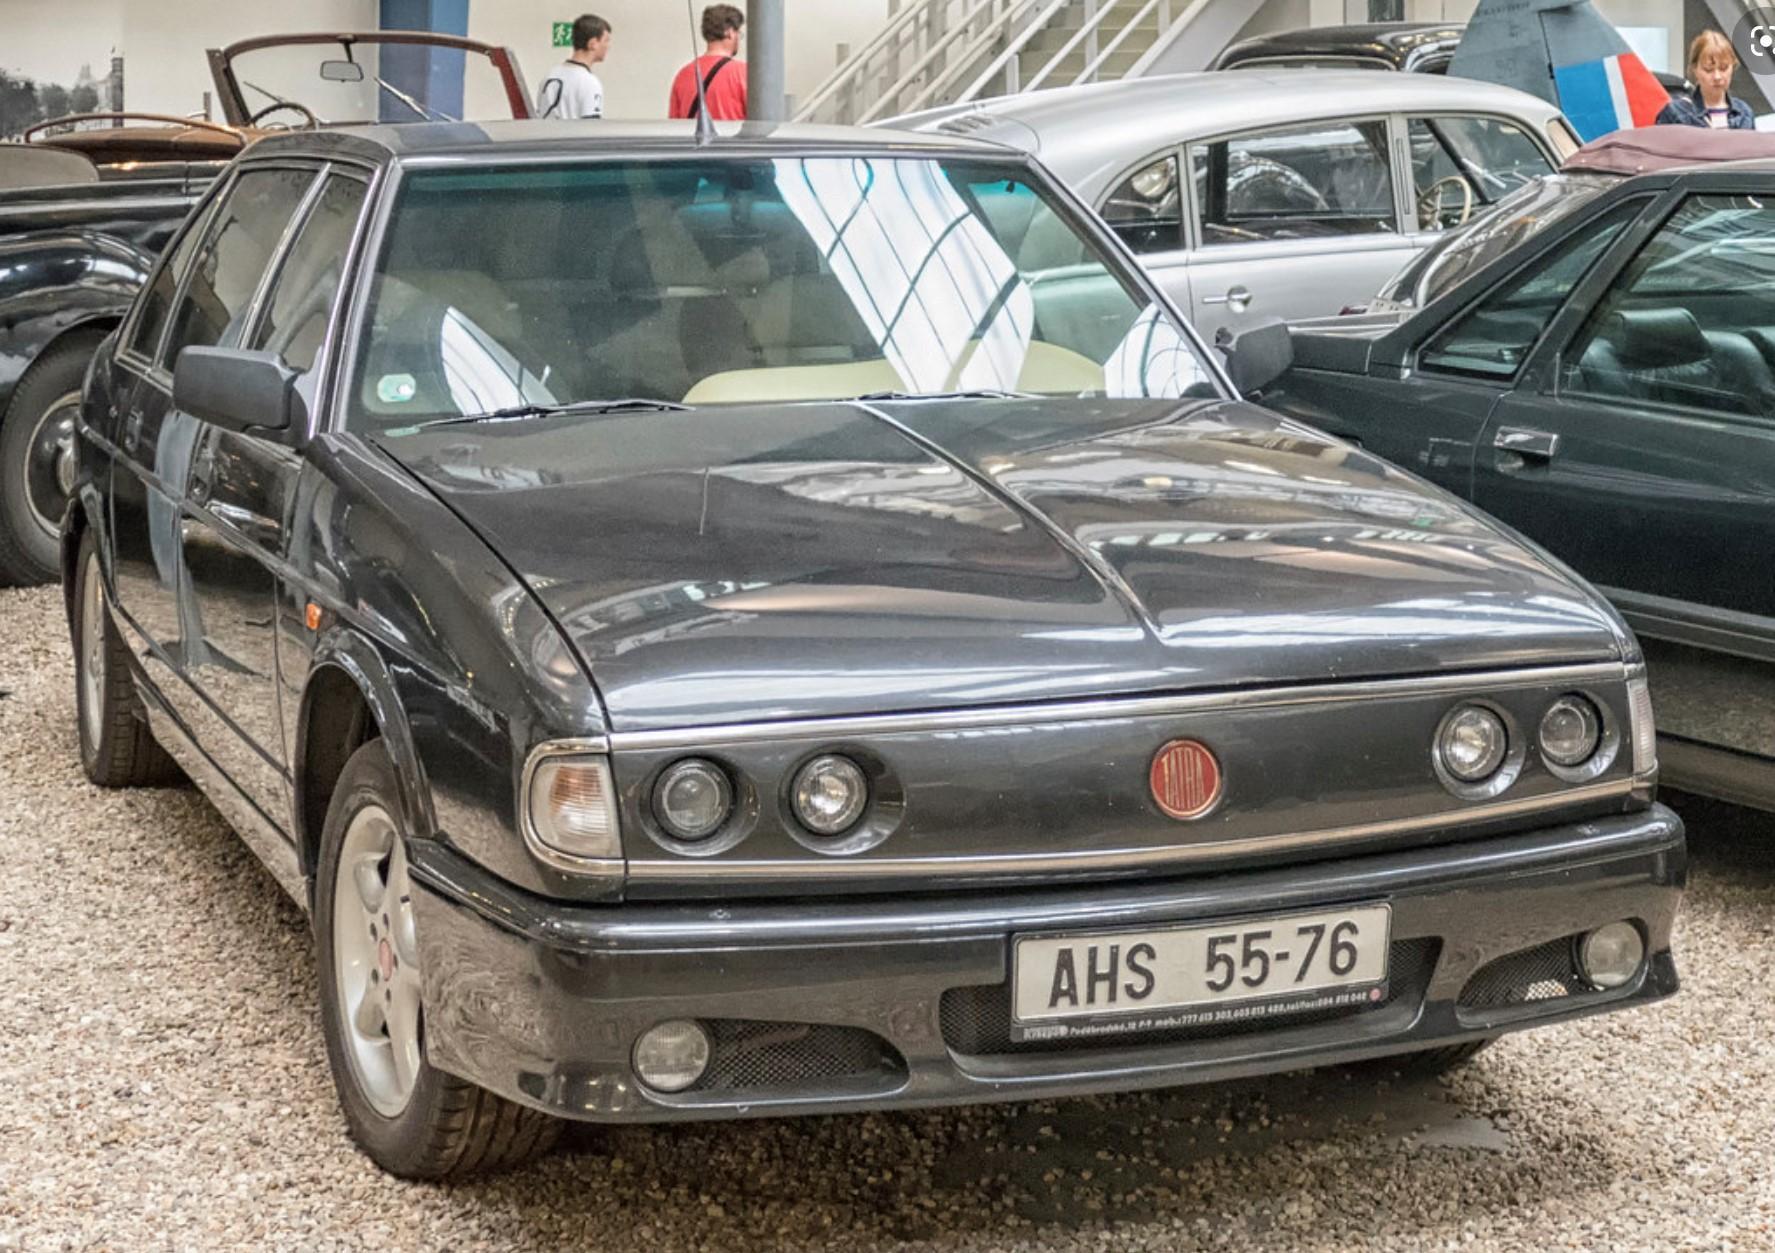 1996-1999 Tatra 700 the last saloon model they made, with 4.4 V8 power.